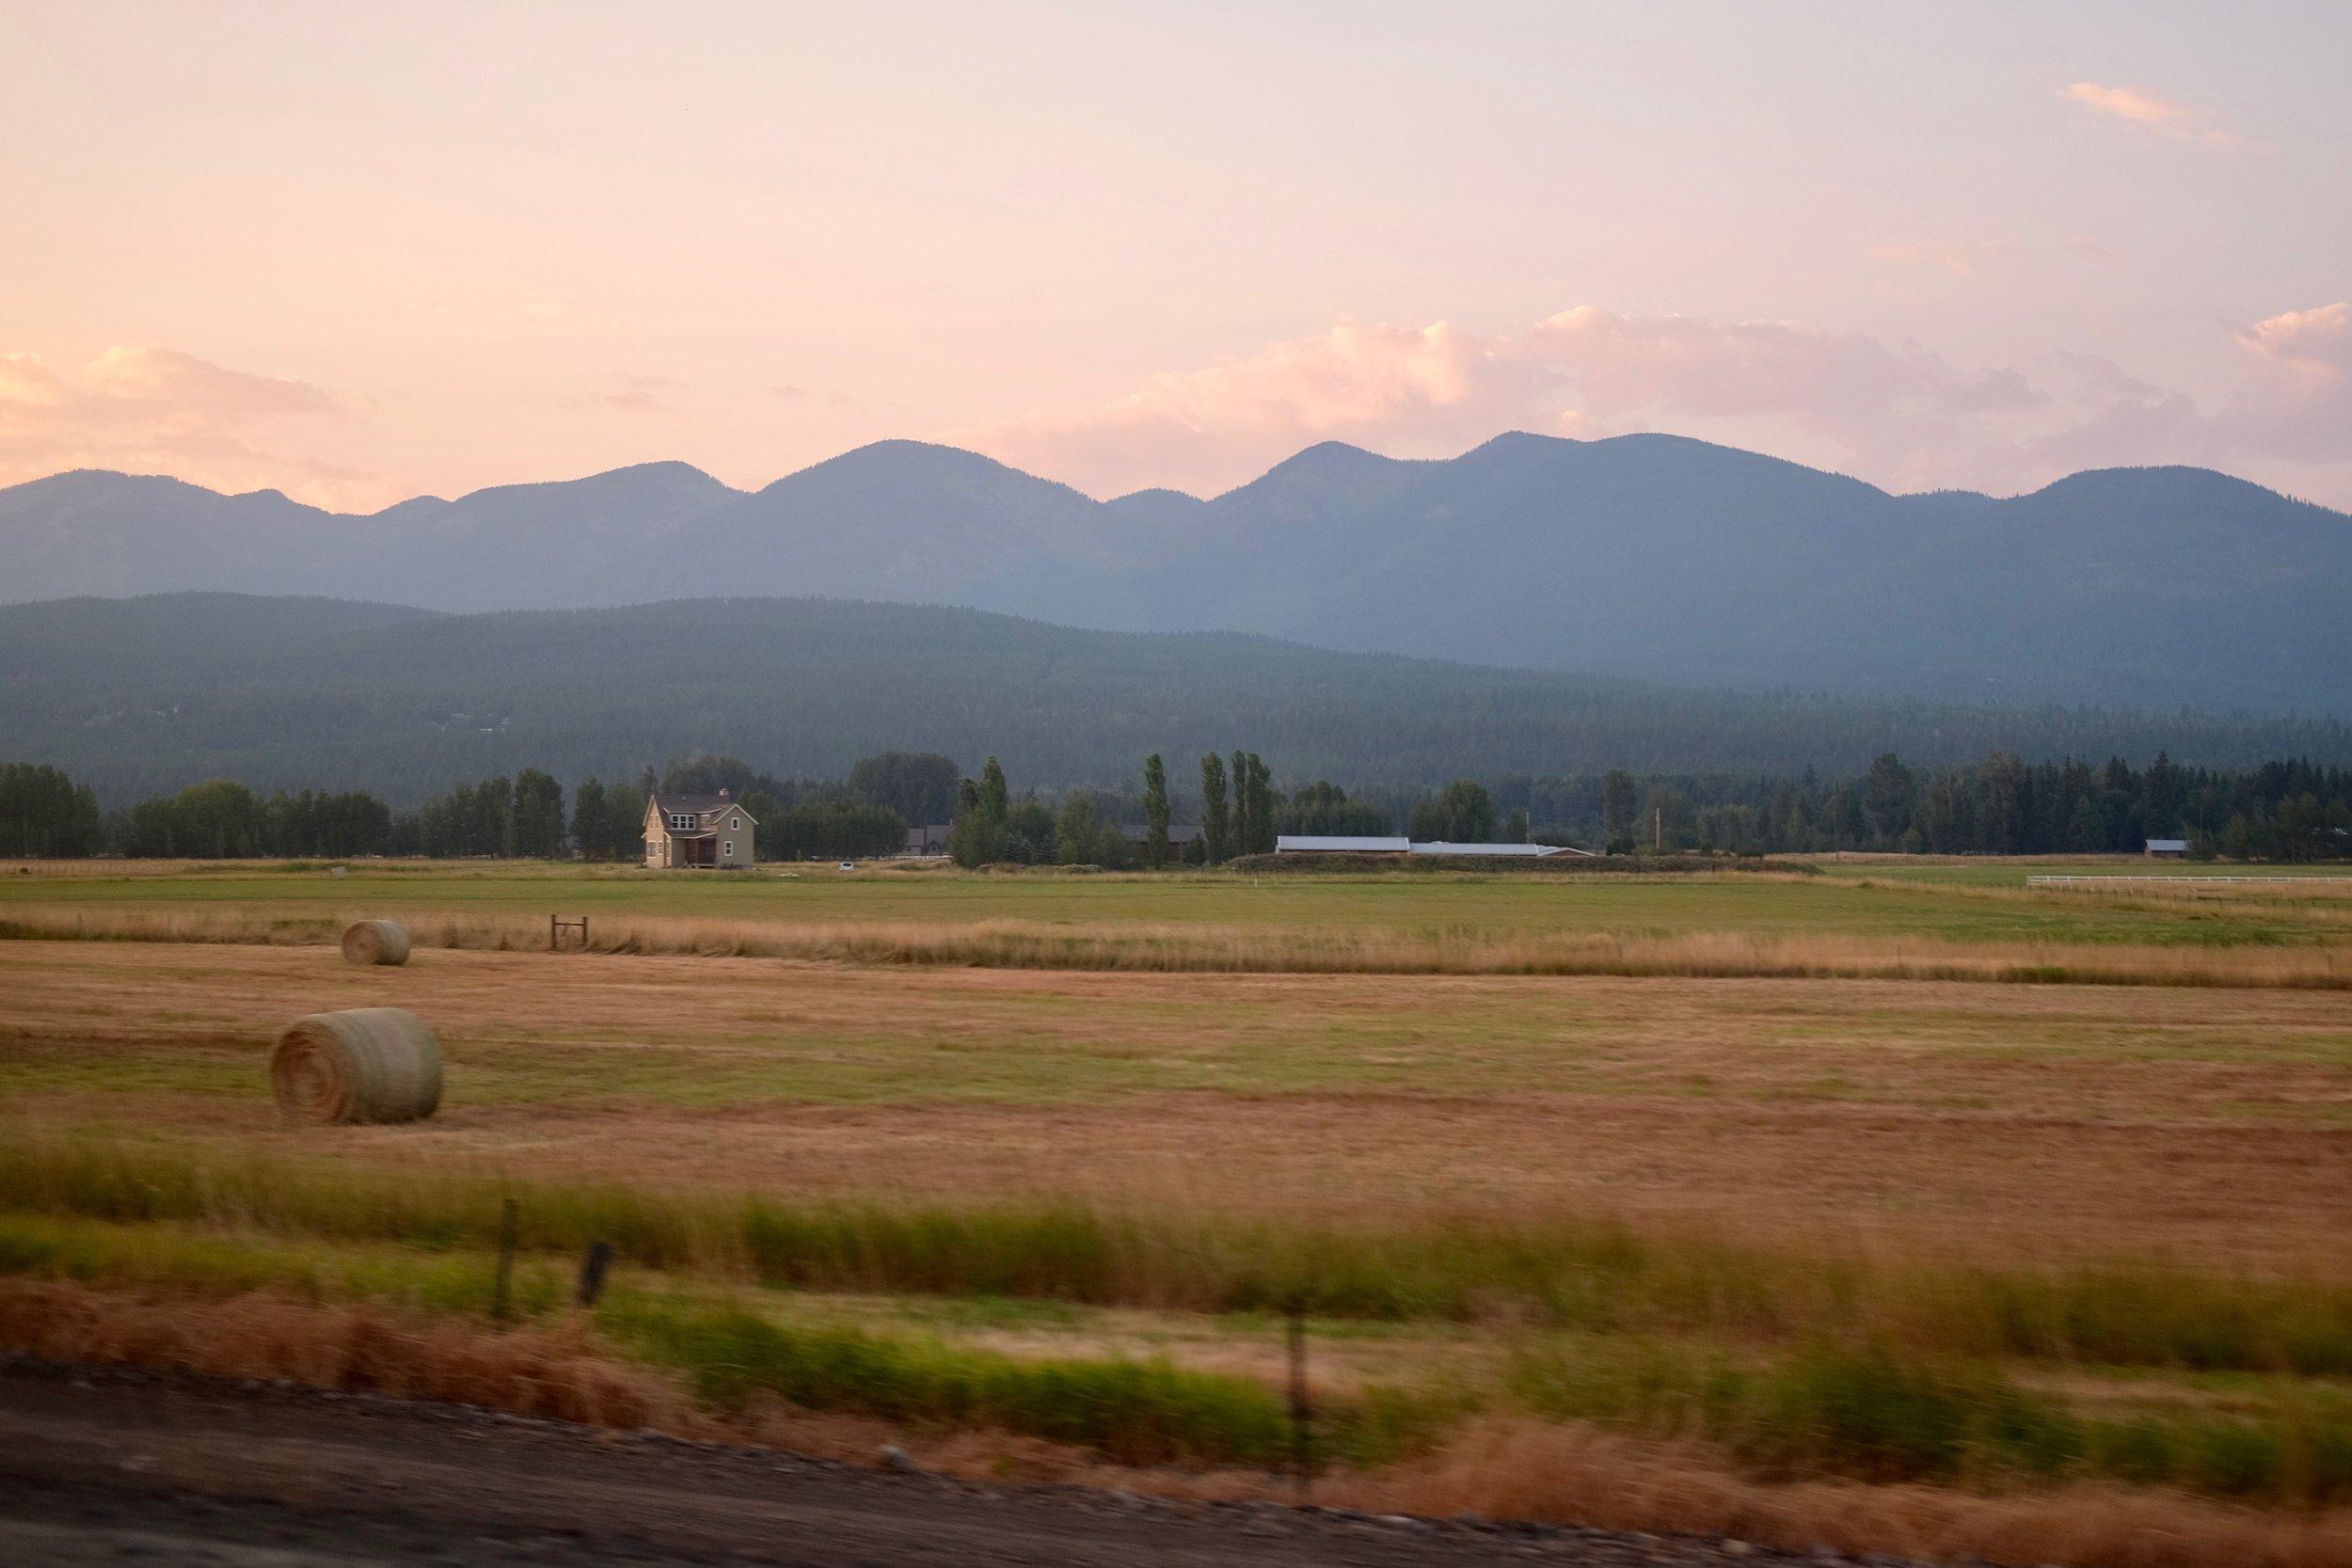 The sun setting in Whitefish, Montana